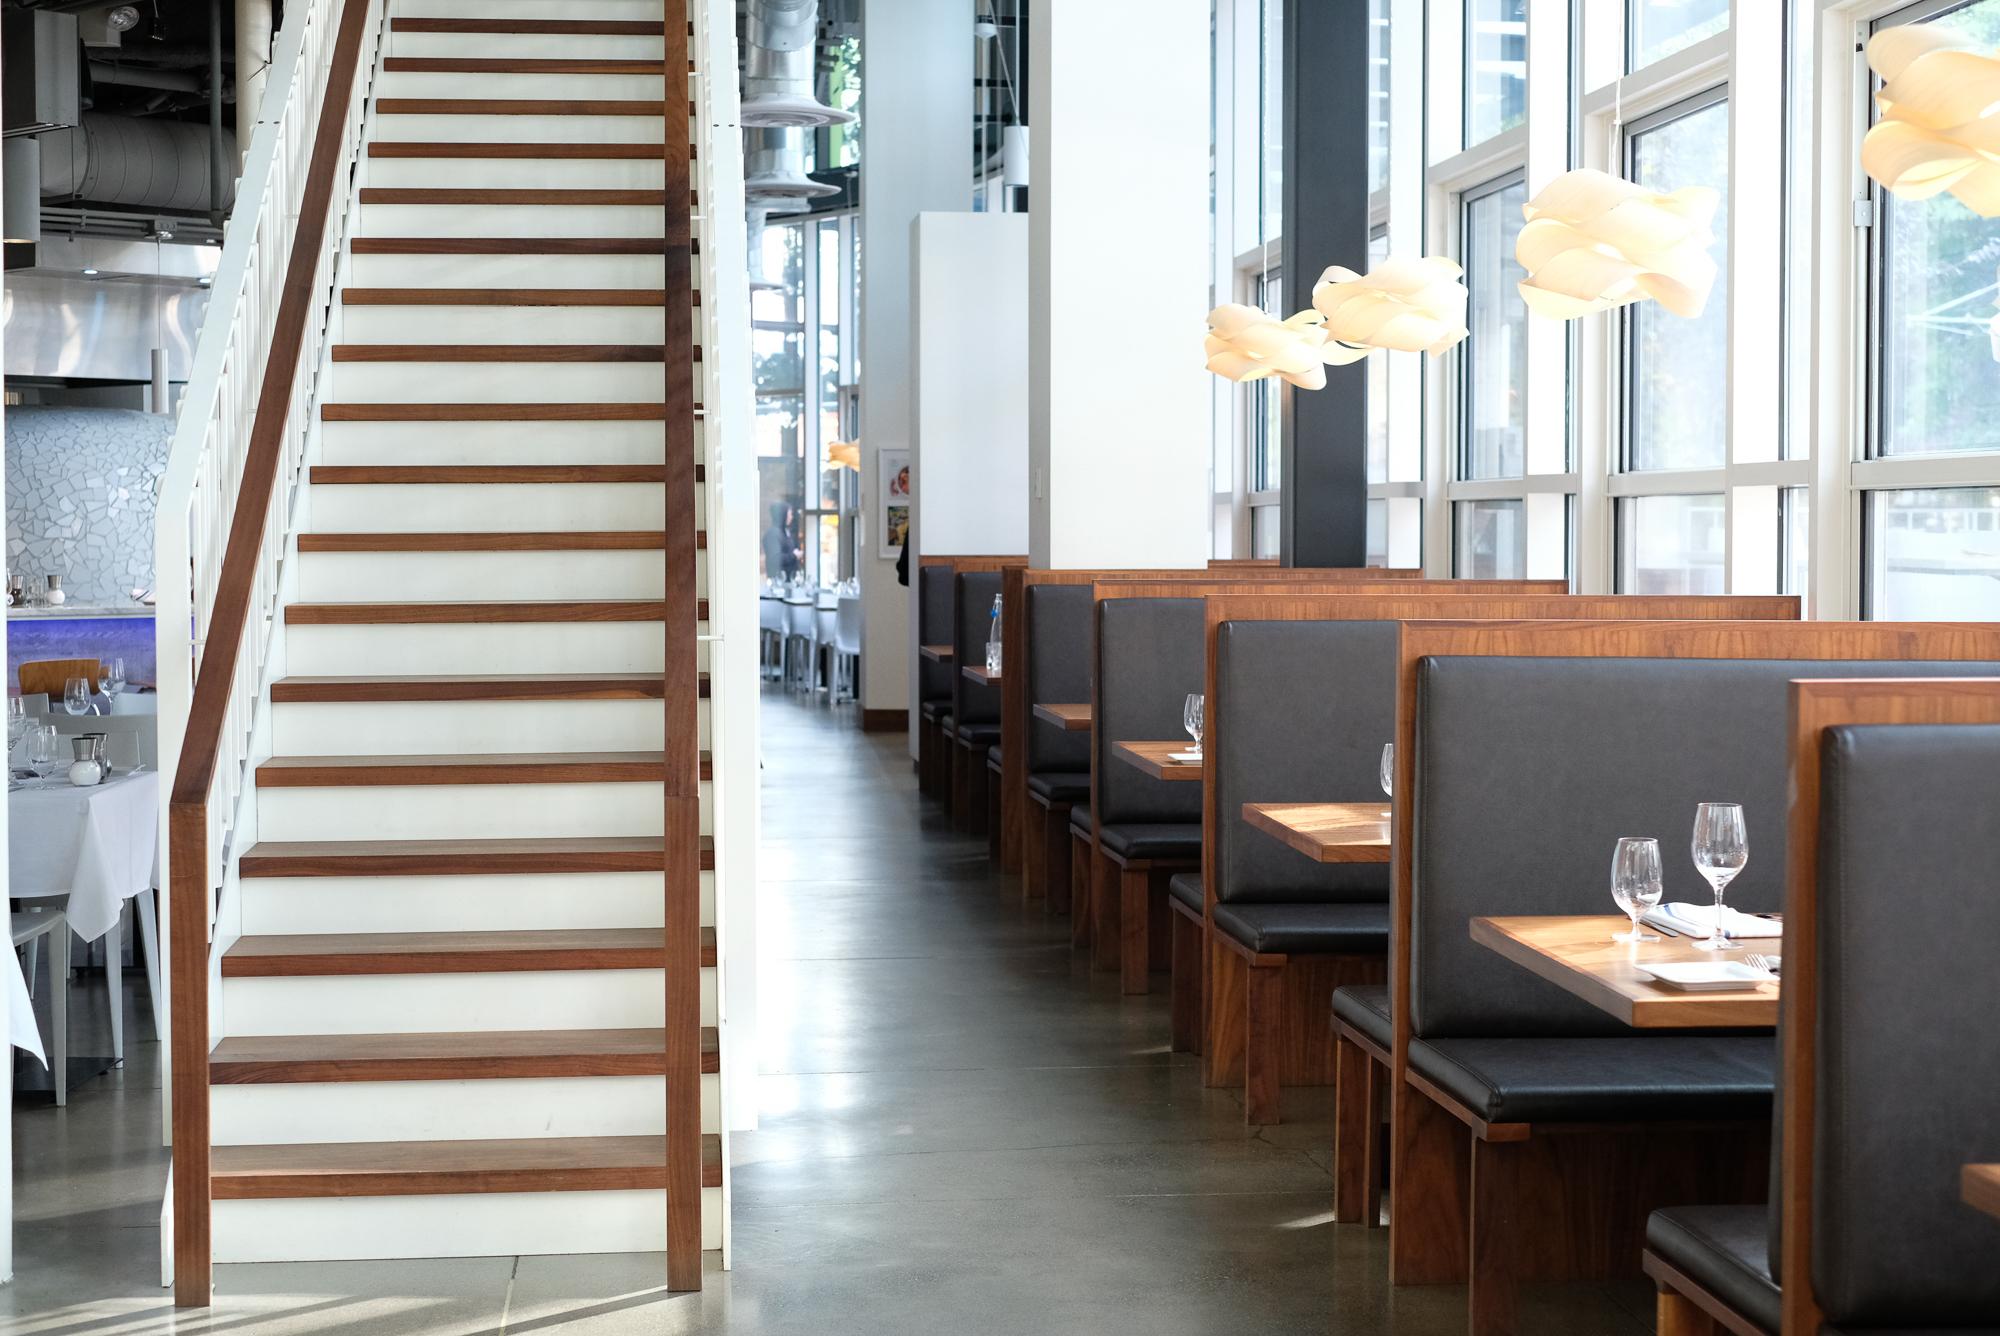 Cinque Terre Ristorante Dining Room